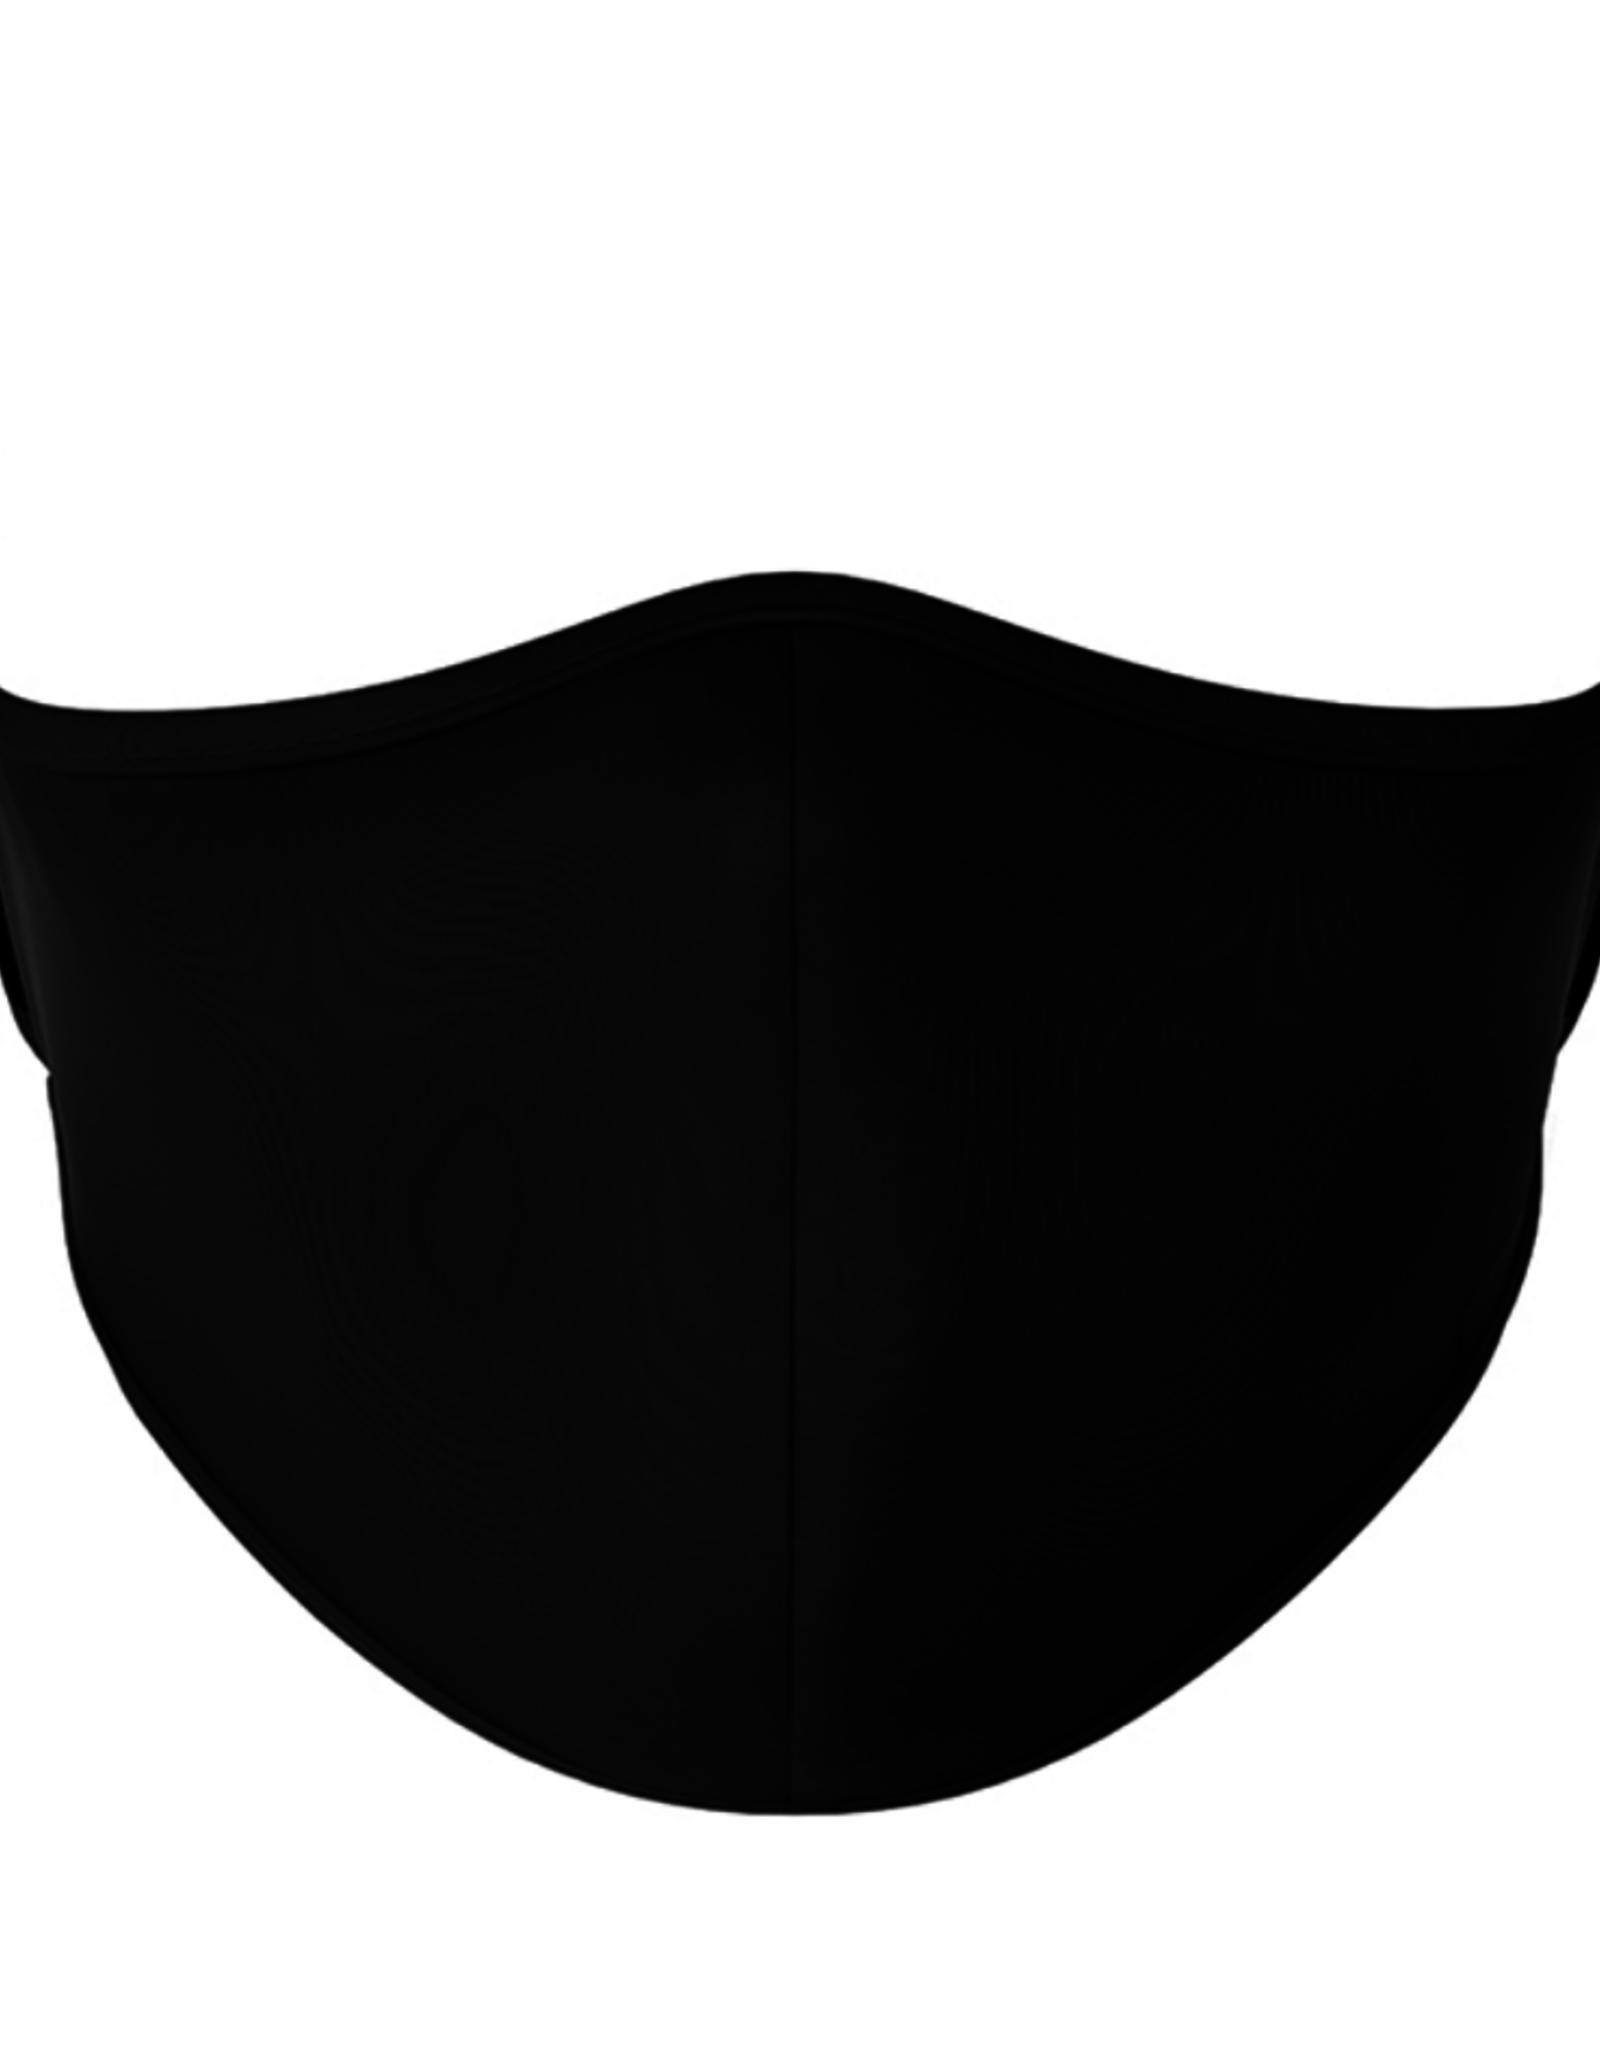 Top Trenz Top Trenz - Large Mask - Solid Black